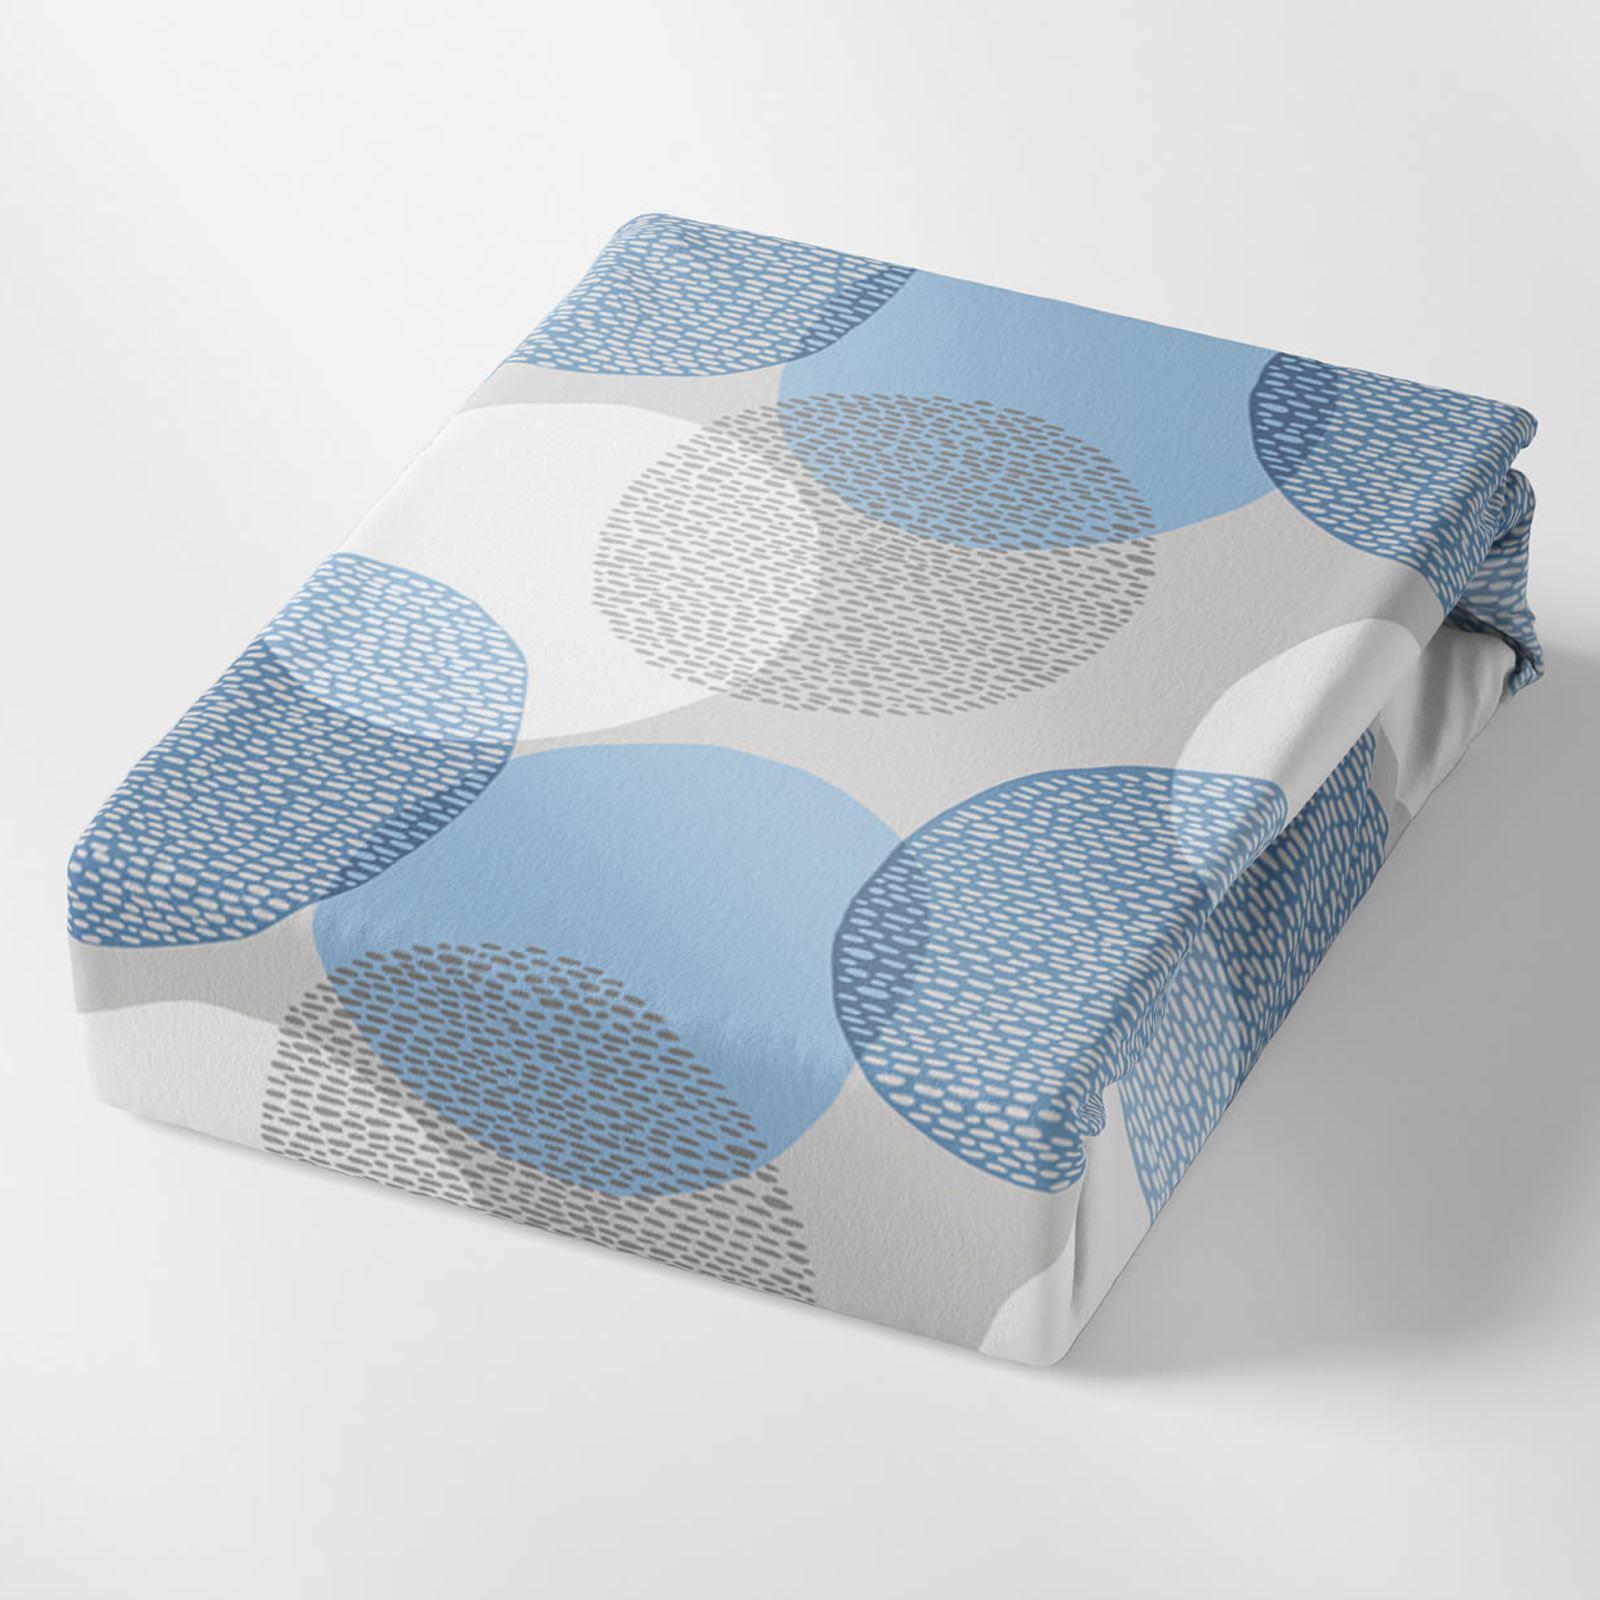 Funda-nordica-azul-azul-marino-verde-azulado-edredon-algodon-estampado-juego-conjuntos-de-cama-cubre miniatura 7